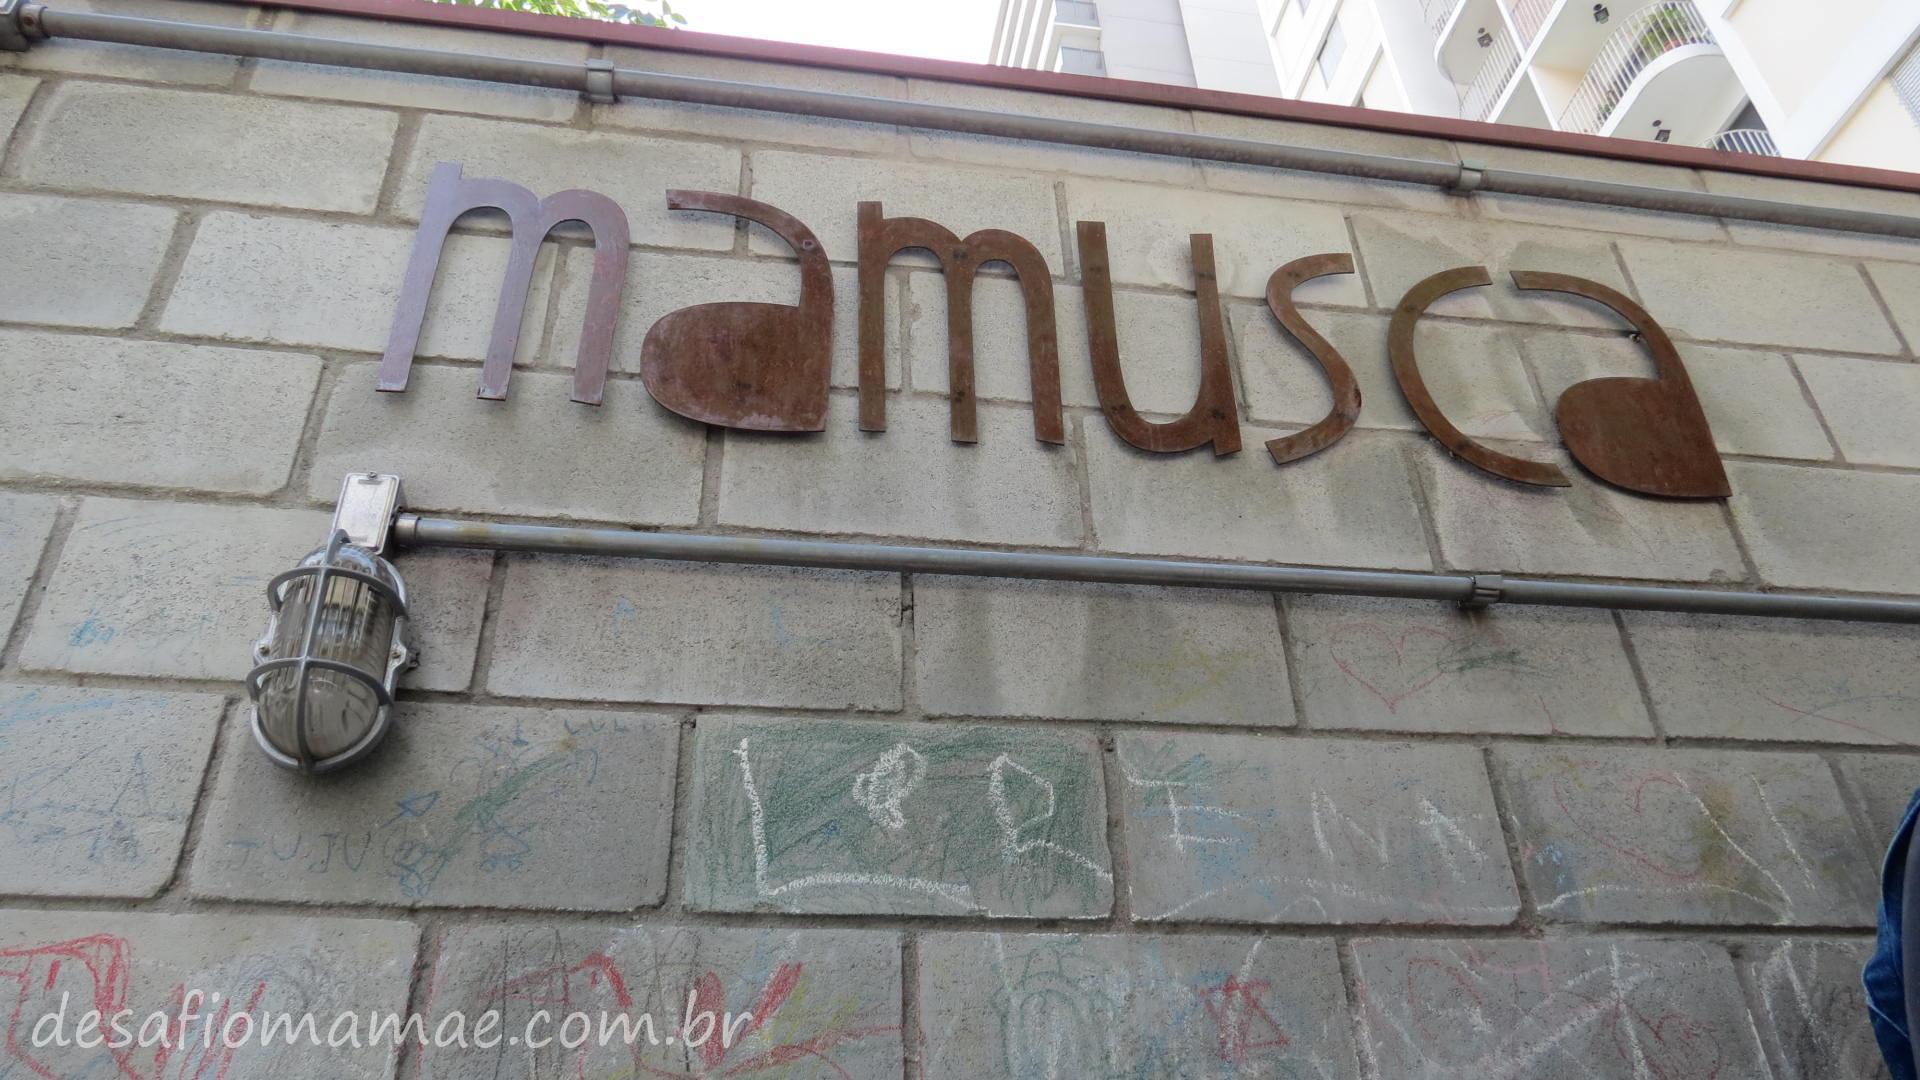 Mamusca